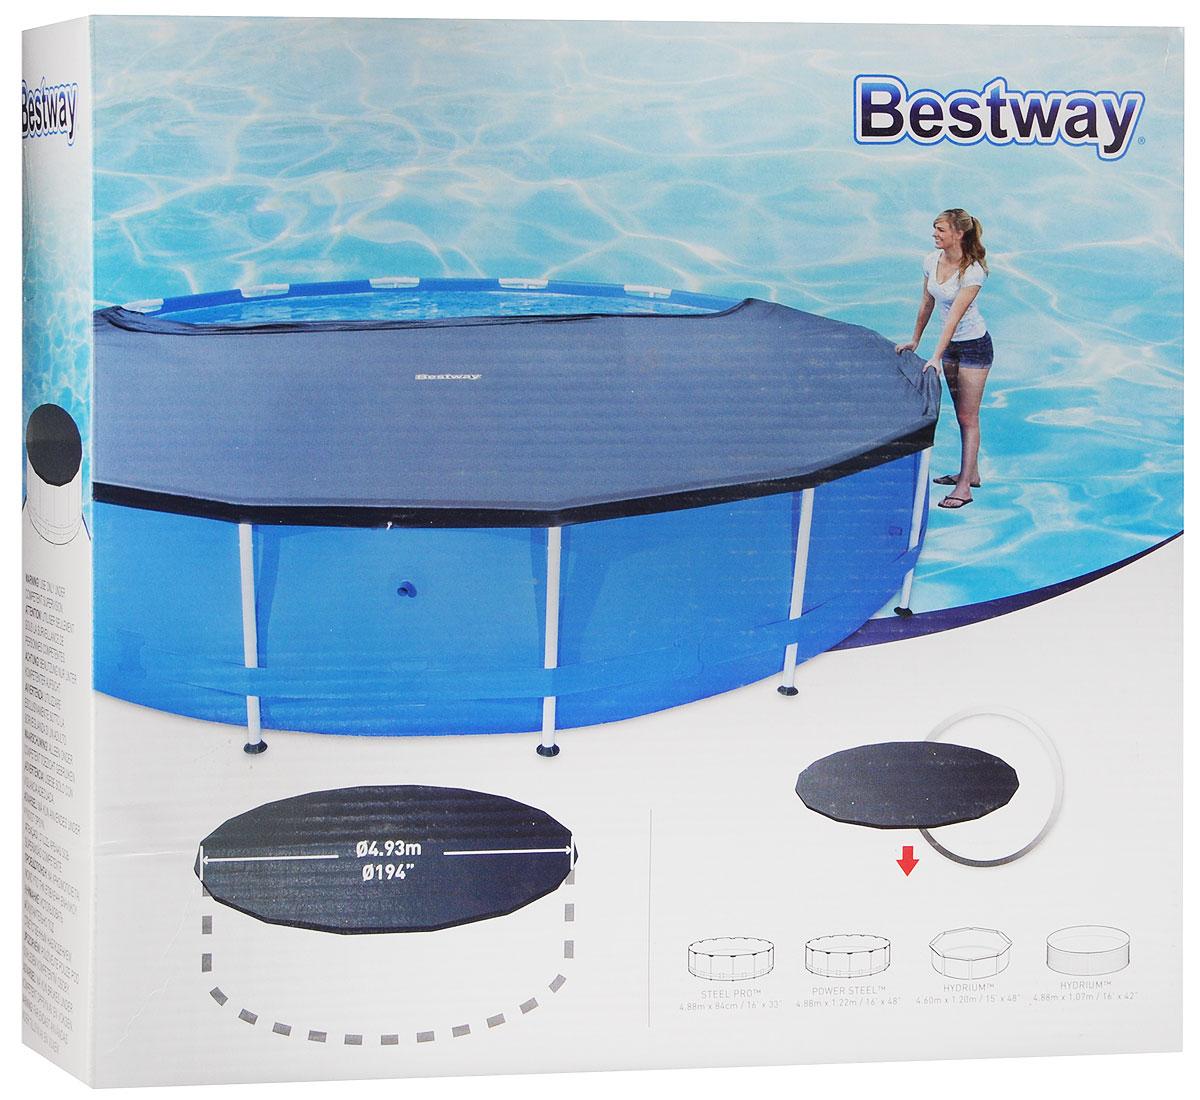 BestwayТент для каркасных бассейнов 493 см Bestway